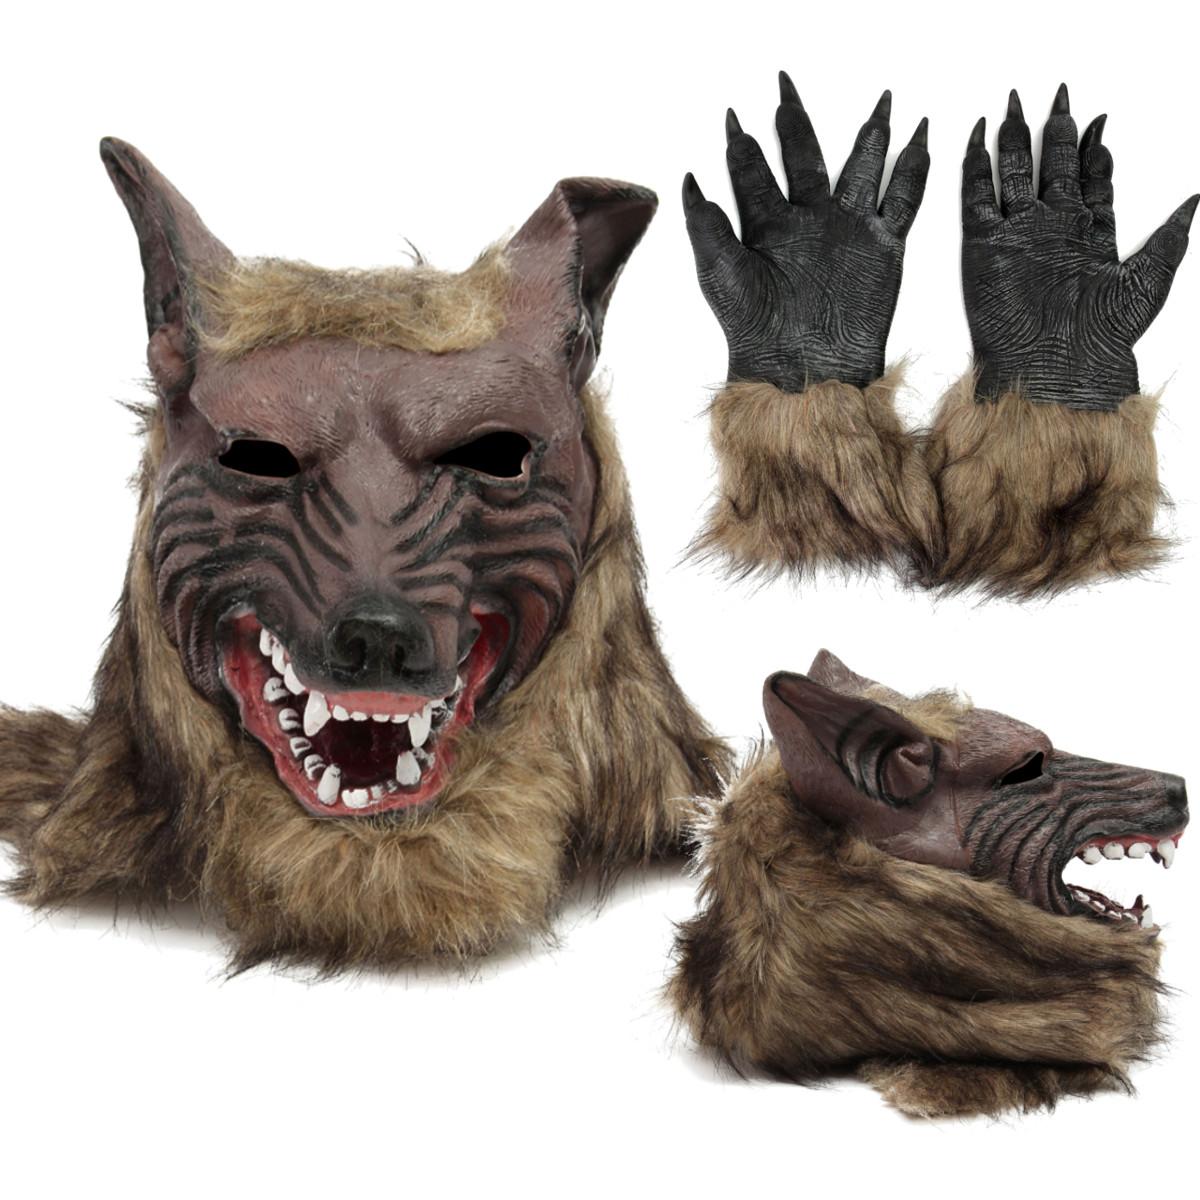 Halloween Déguisement Robe Effrayant Loup warewolf Chien Paws Gris loup-garou gants en latex